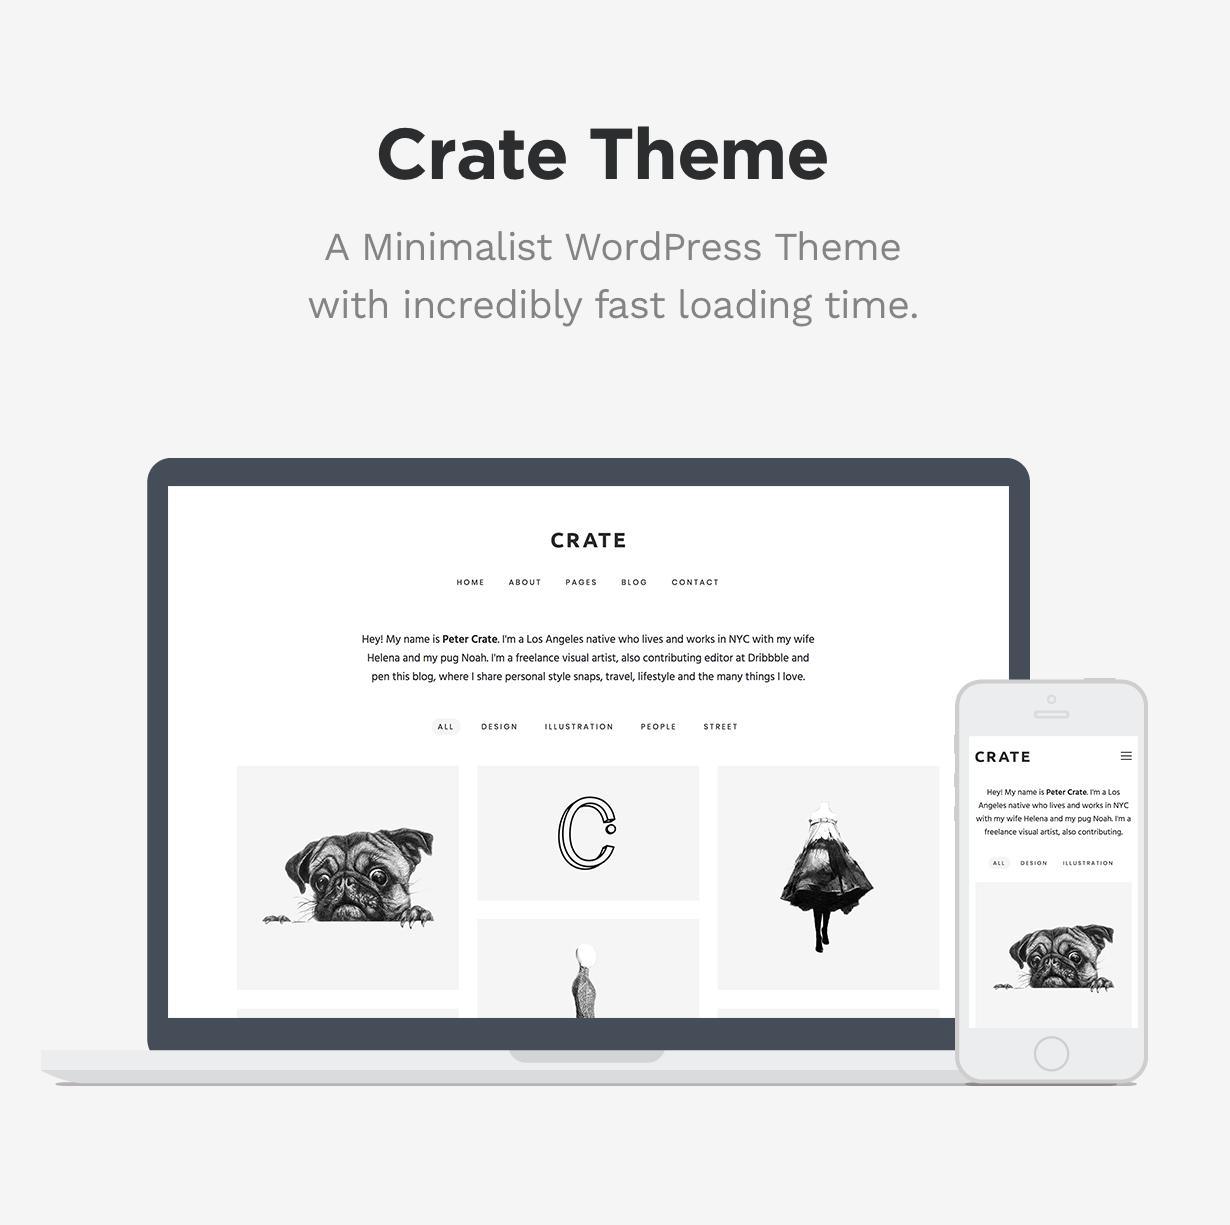 Crate - Minimalist WordPress Theme - 1 crate - minimalist wordpress theme nulled free download Crate – Minimalist WordPress Theme Nulled Free Download intro second